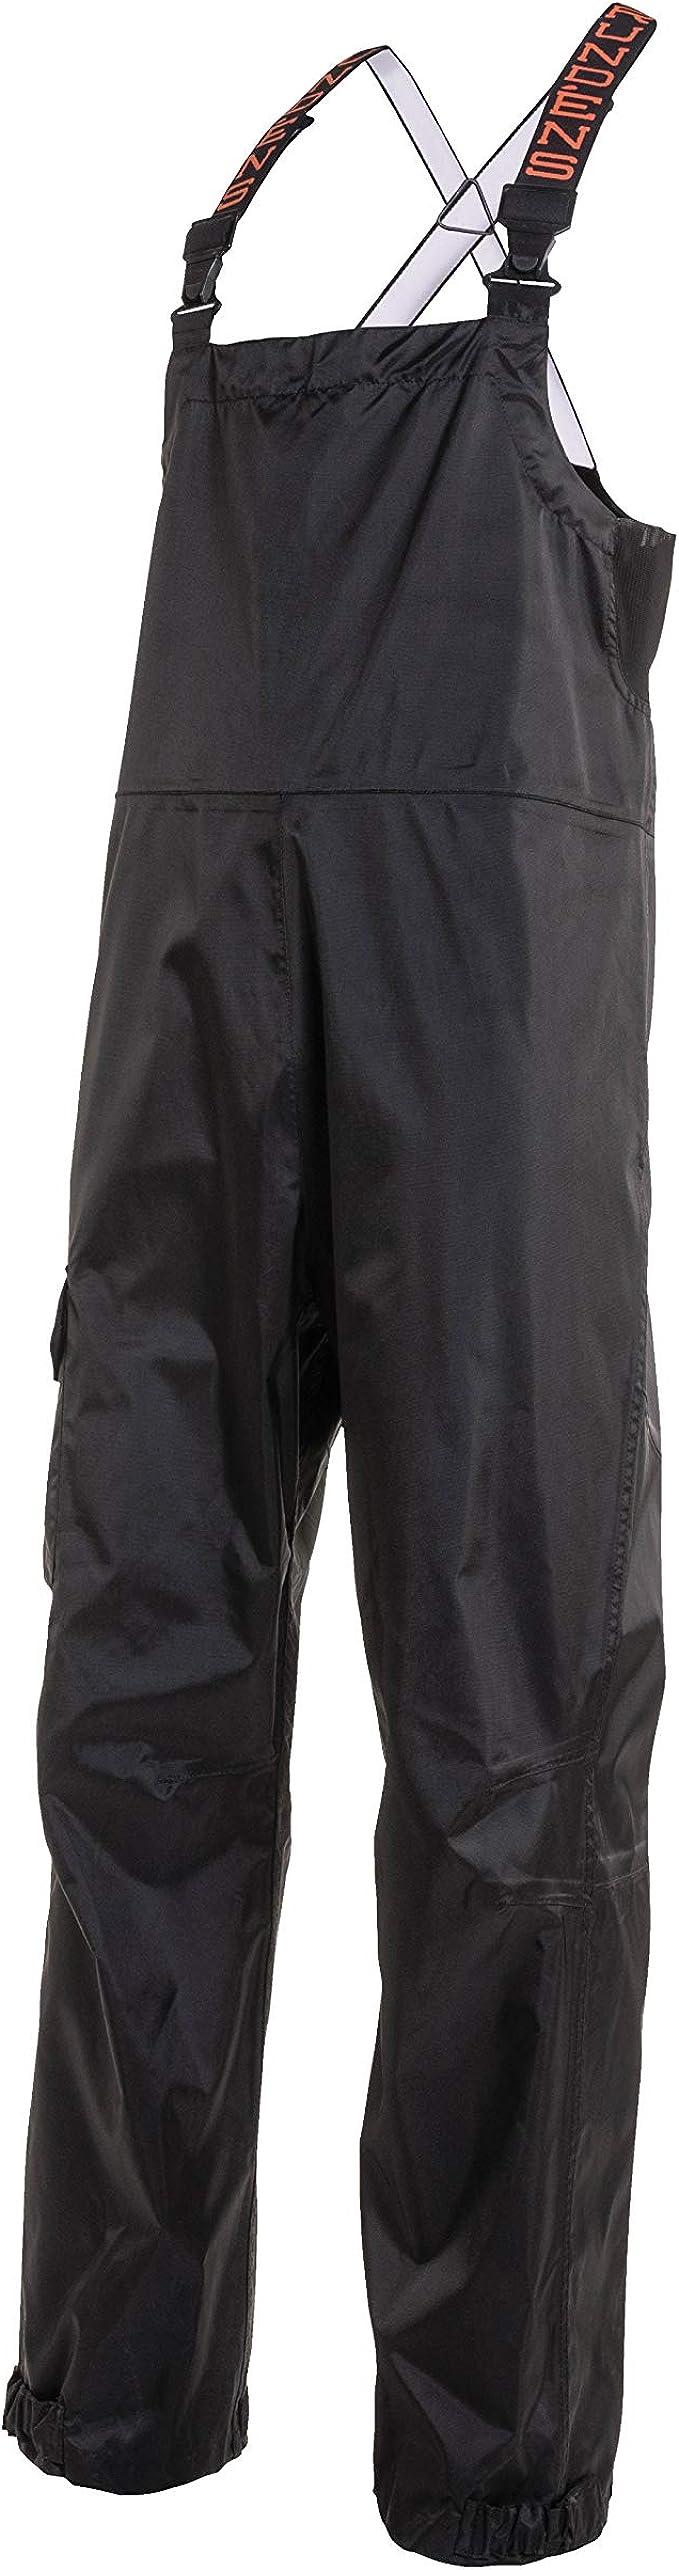 Best Hunting Rain Gear: Grundens Weather Watch Fishing Bib Trousers